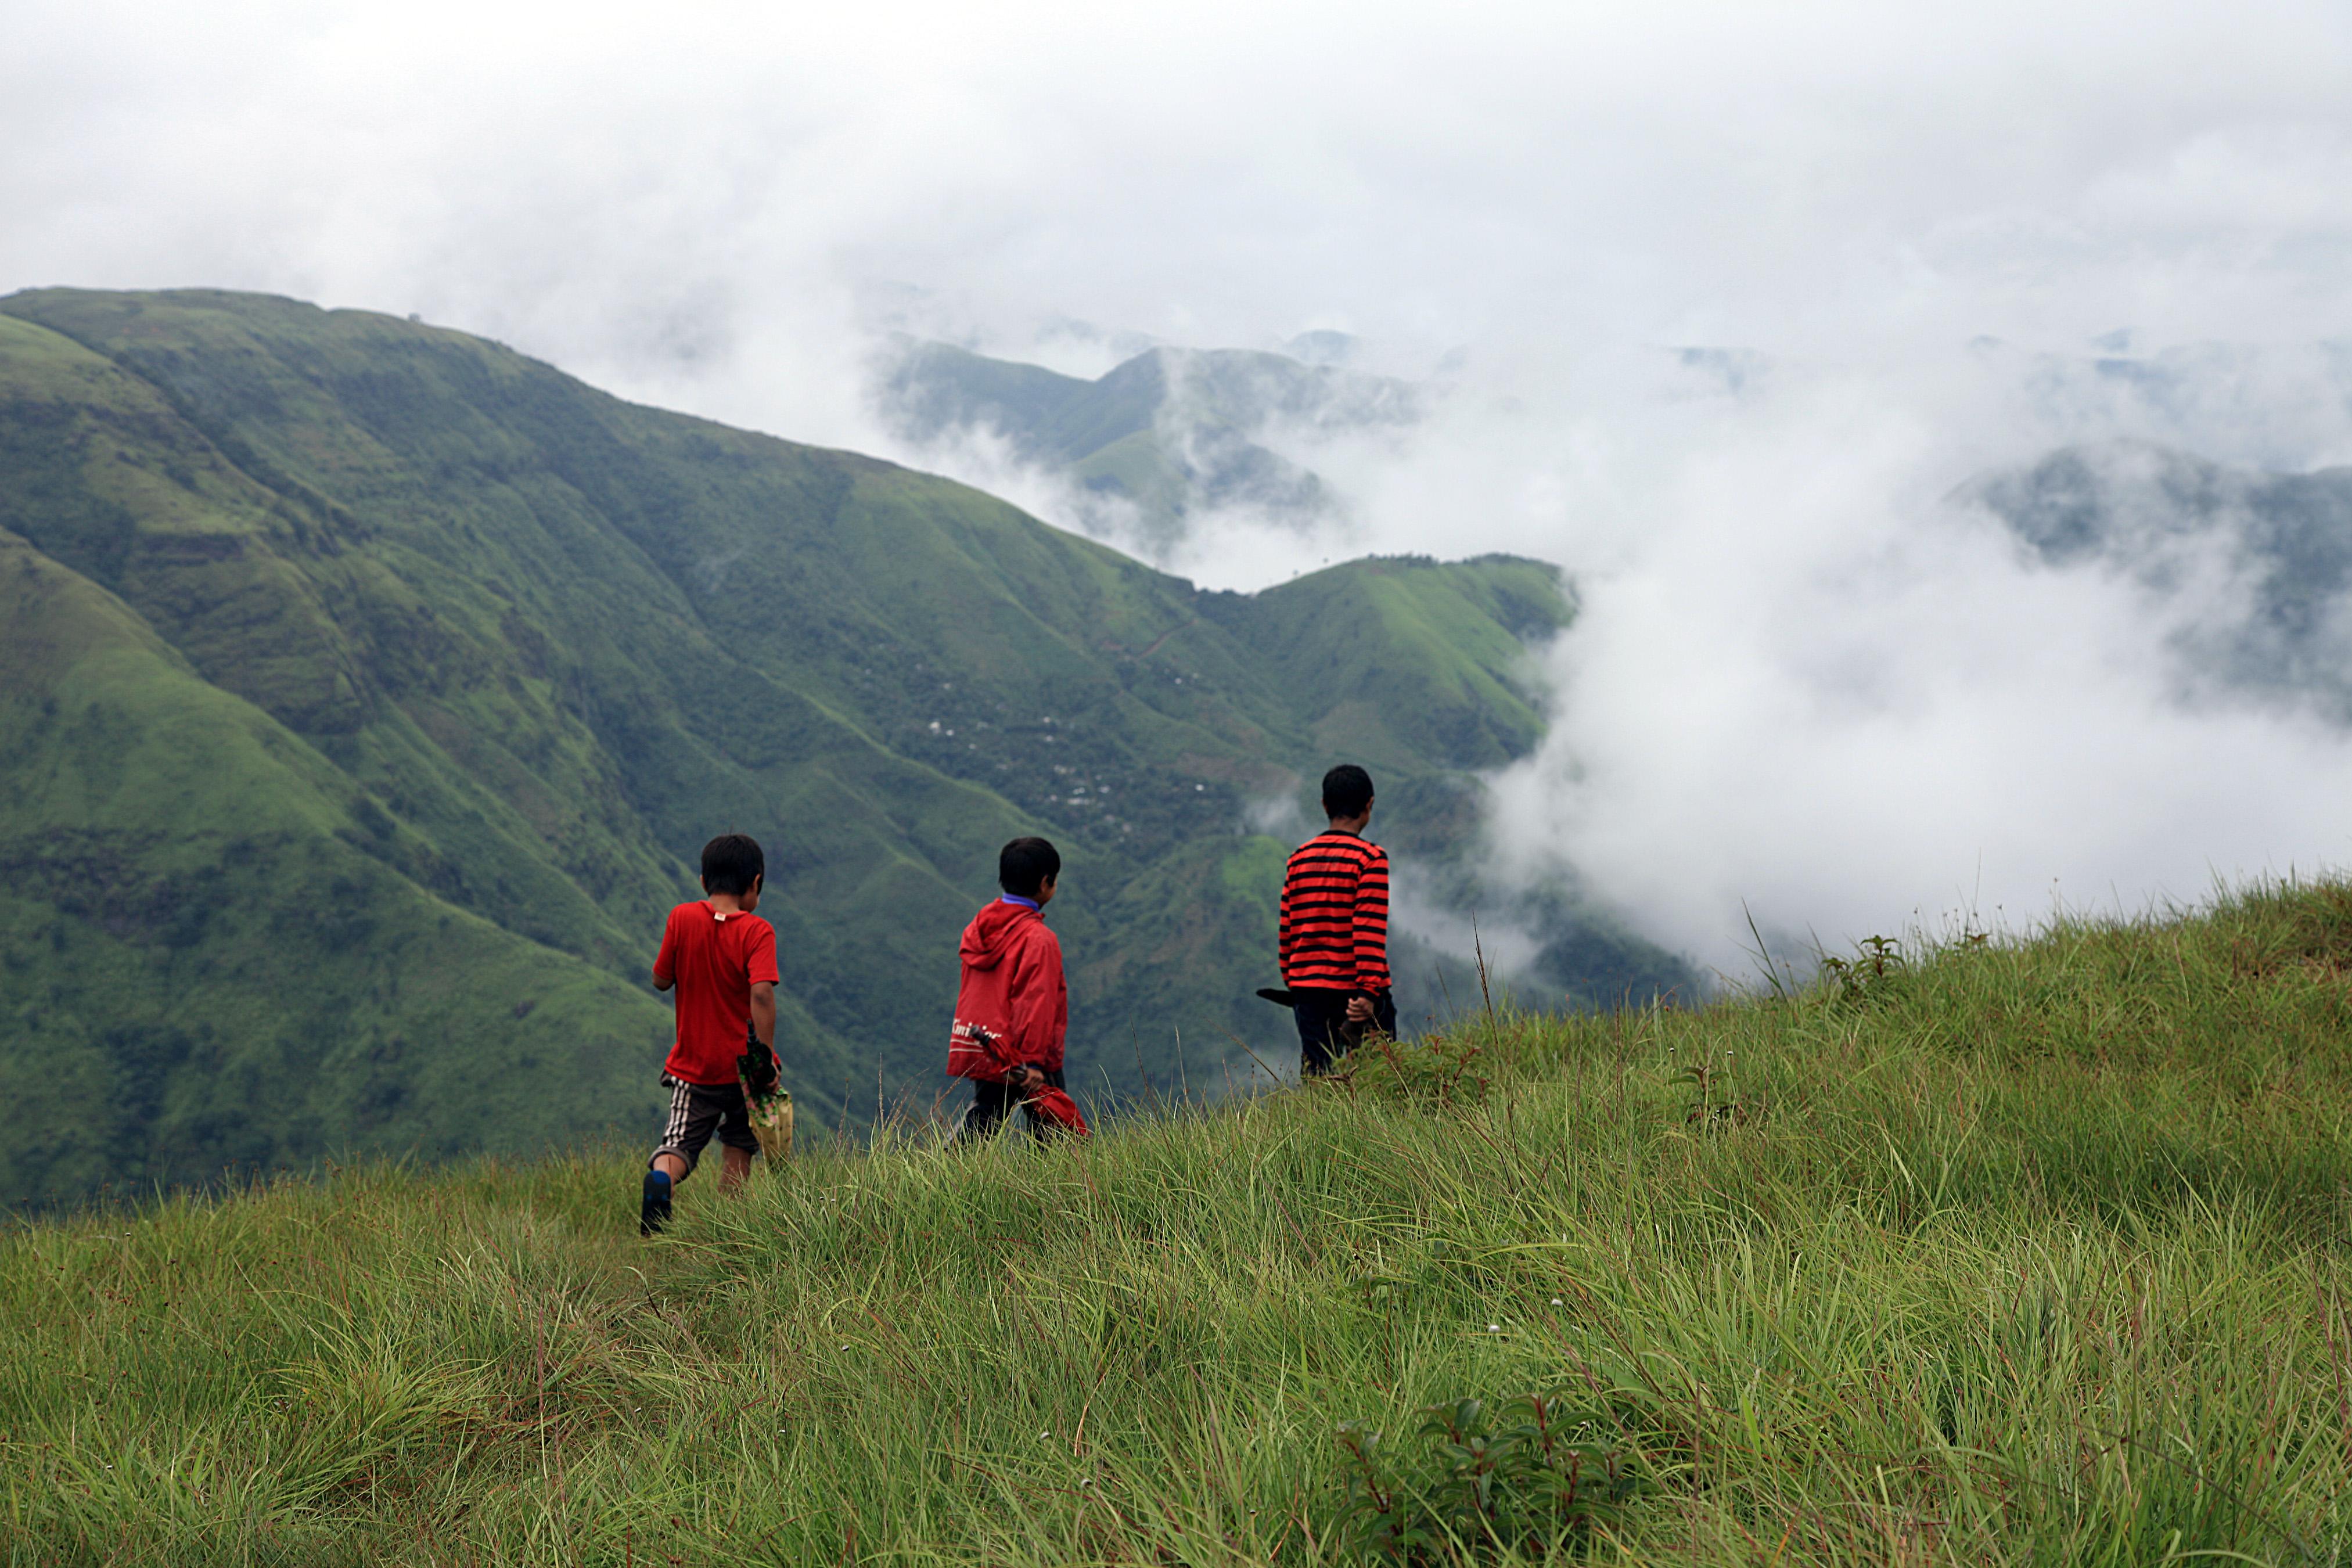 Description geography nature of meghalaya laitmawsiang landscape india